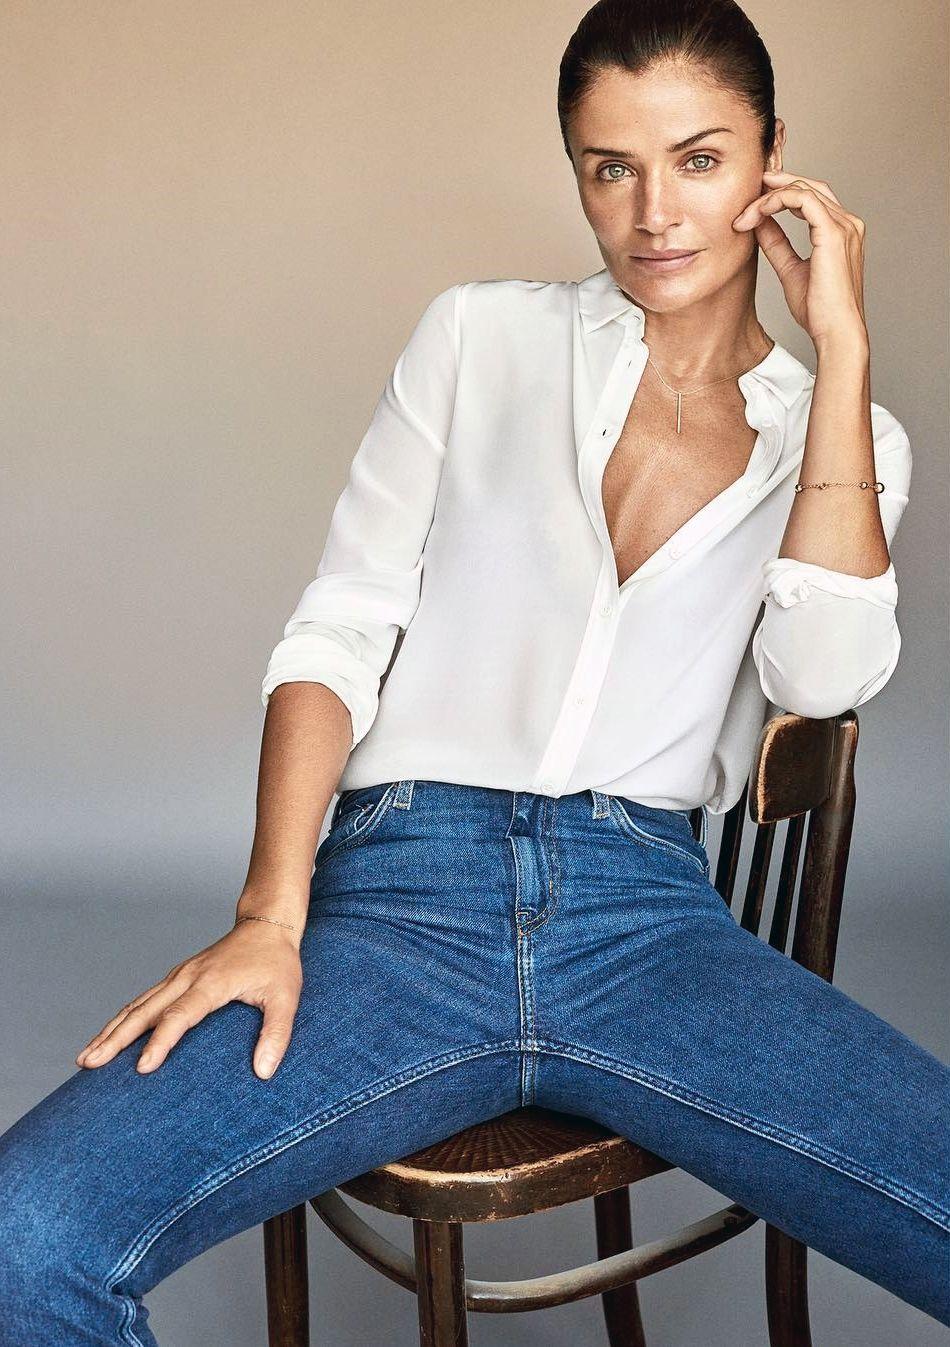 Helena Christensen For Inwear Fall Winter 2016 Helena